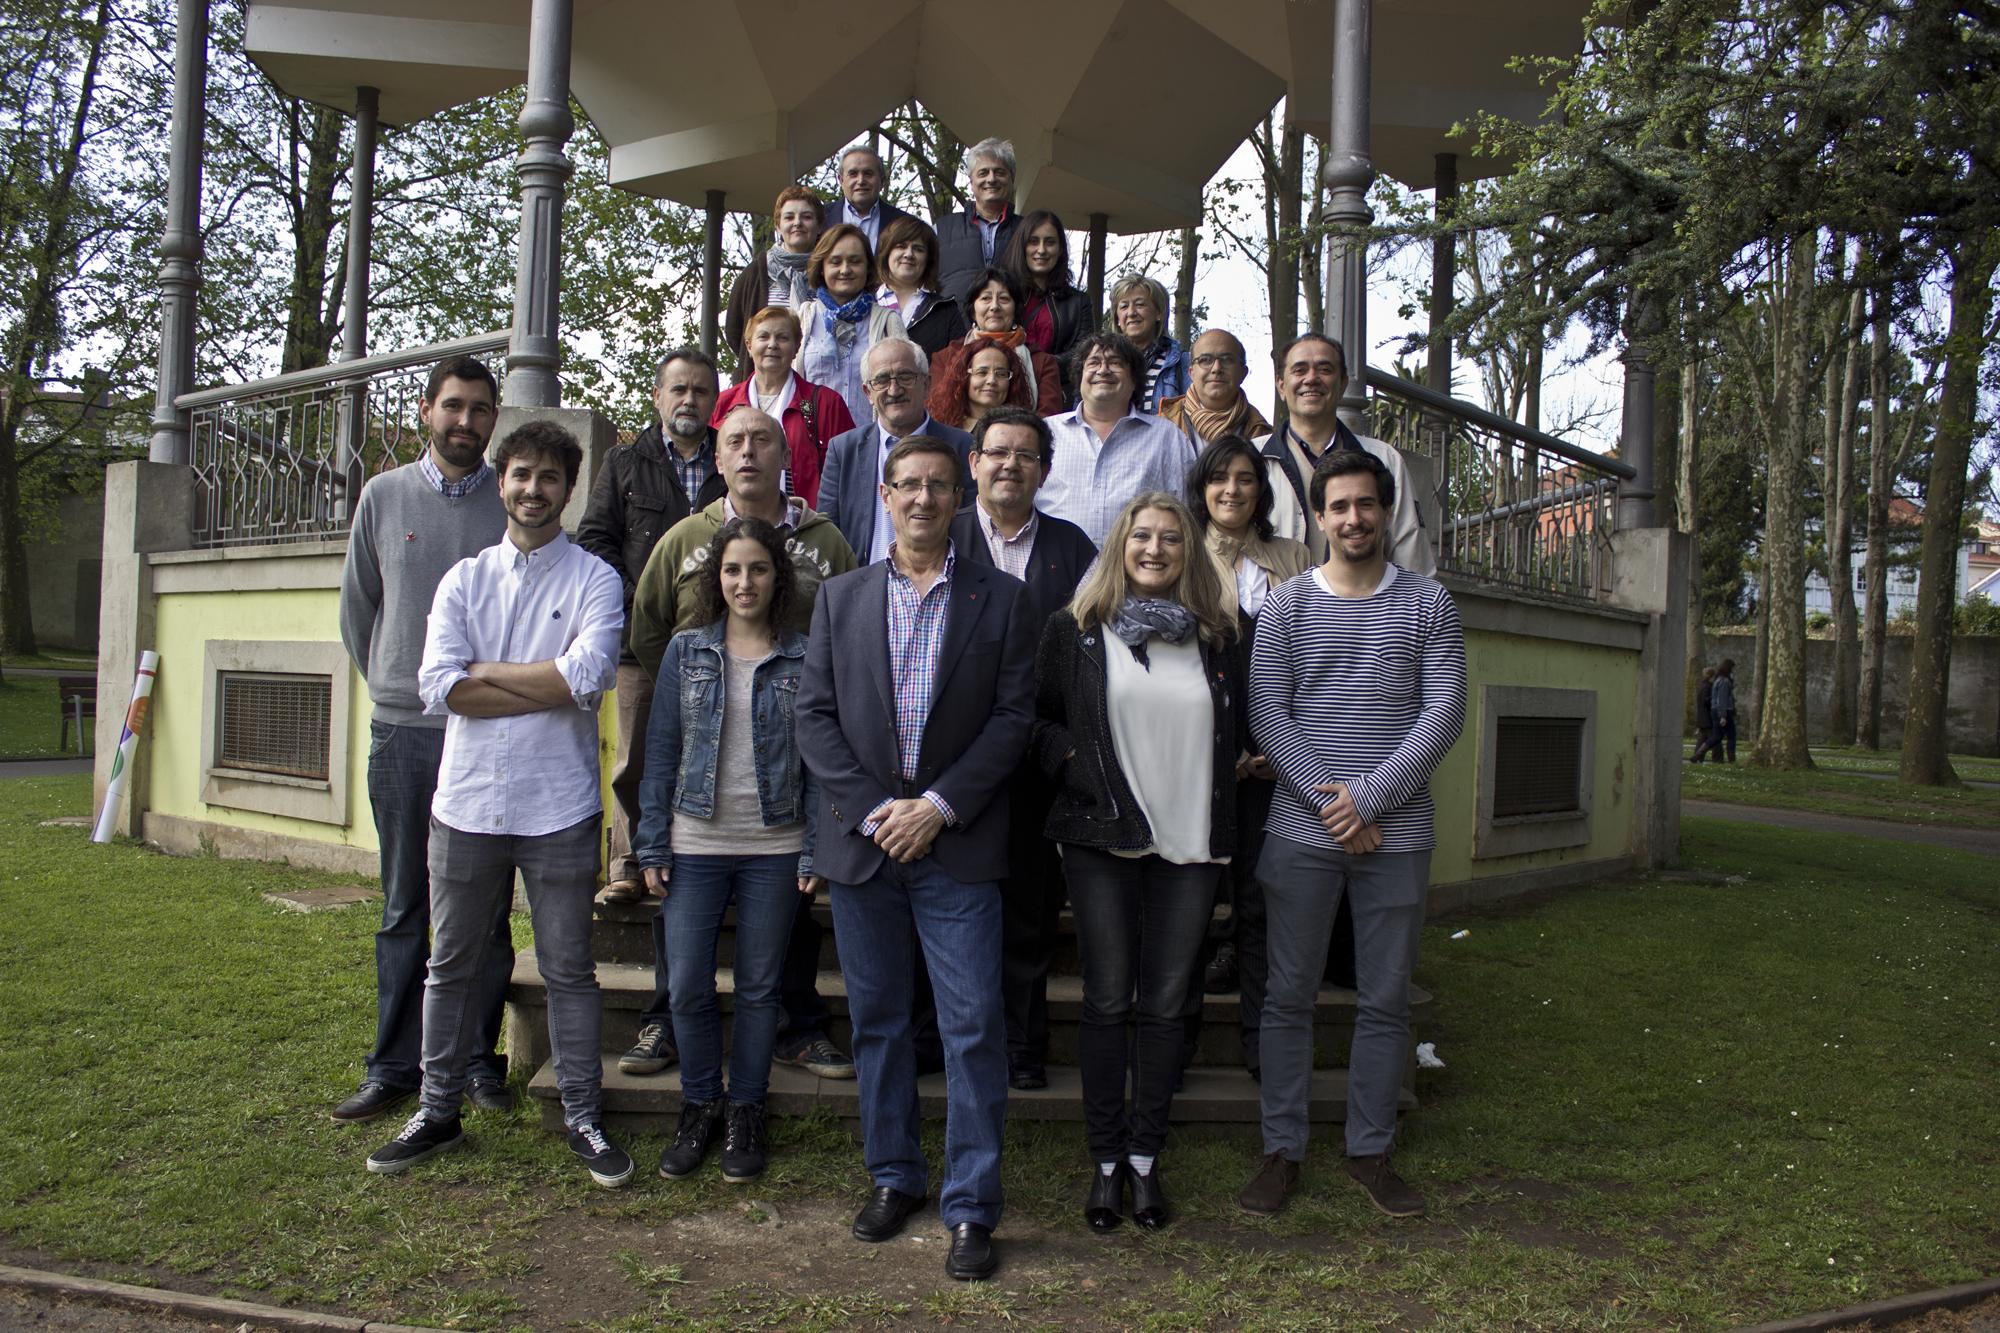 candidatura IU municipales 2015